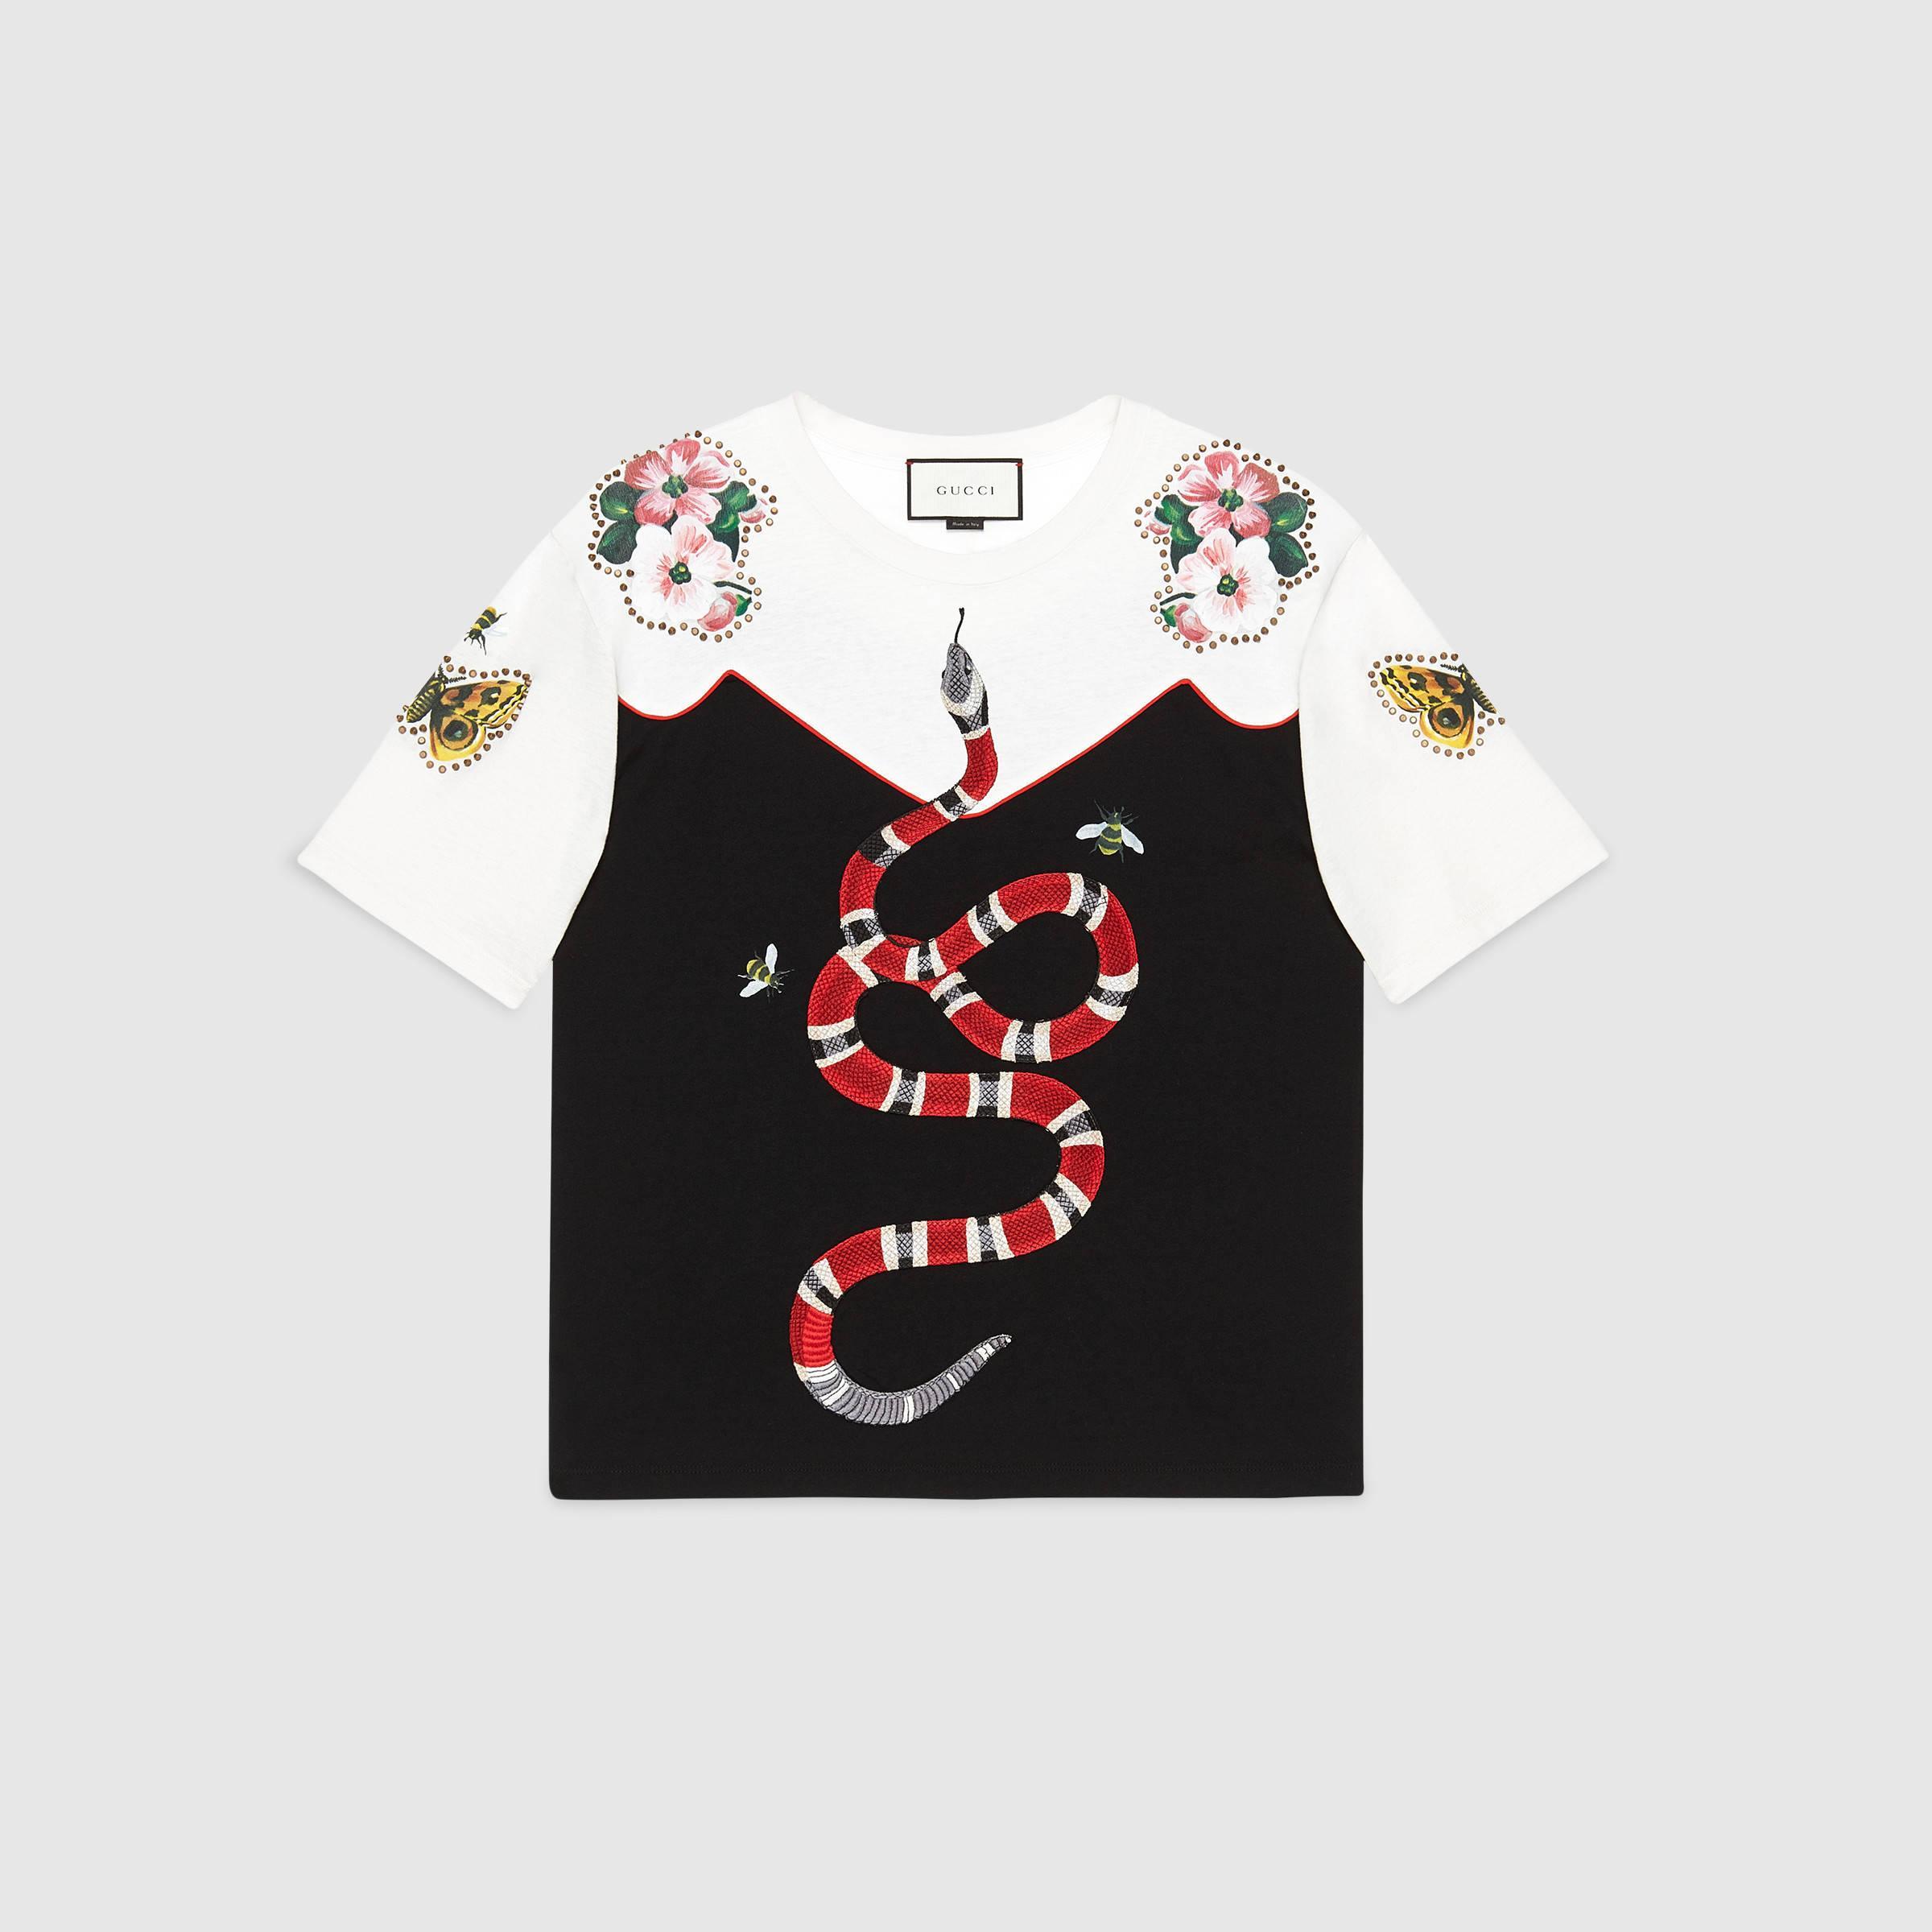 c68aebcde38e Gucci Garden Exclusive T-shirt - Lyst